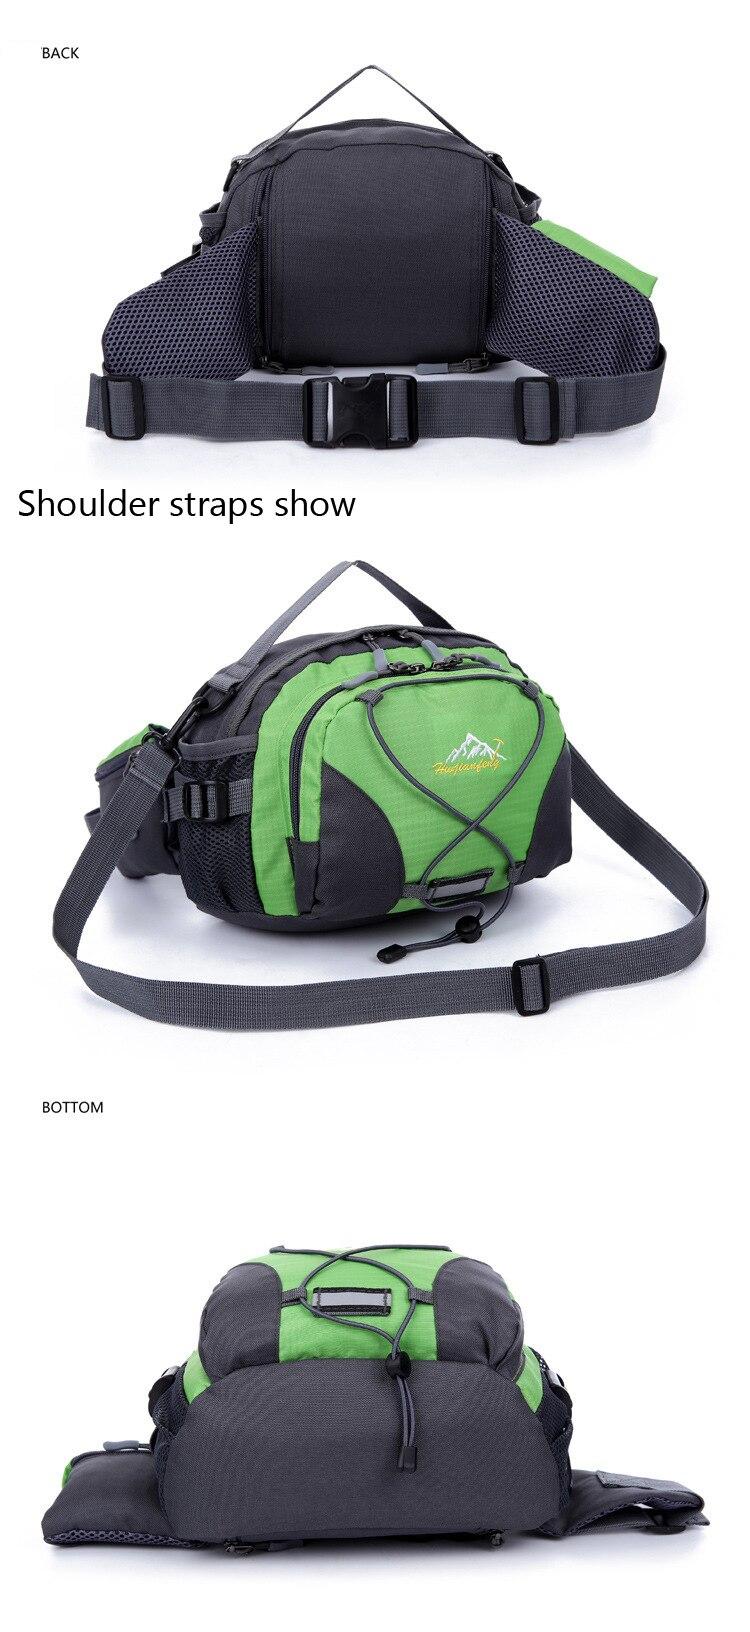 hikiing bolsas cintura saco à prova dnylon água náilon